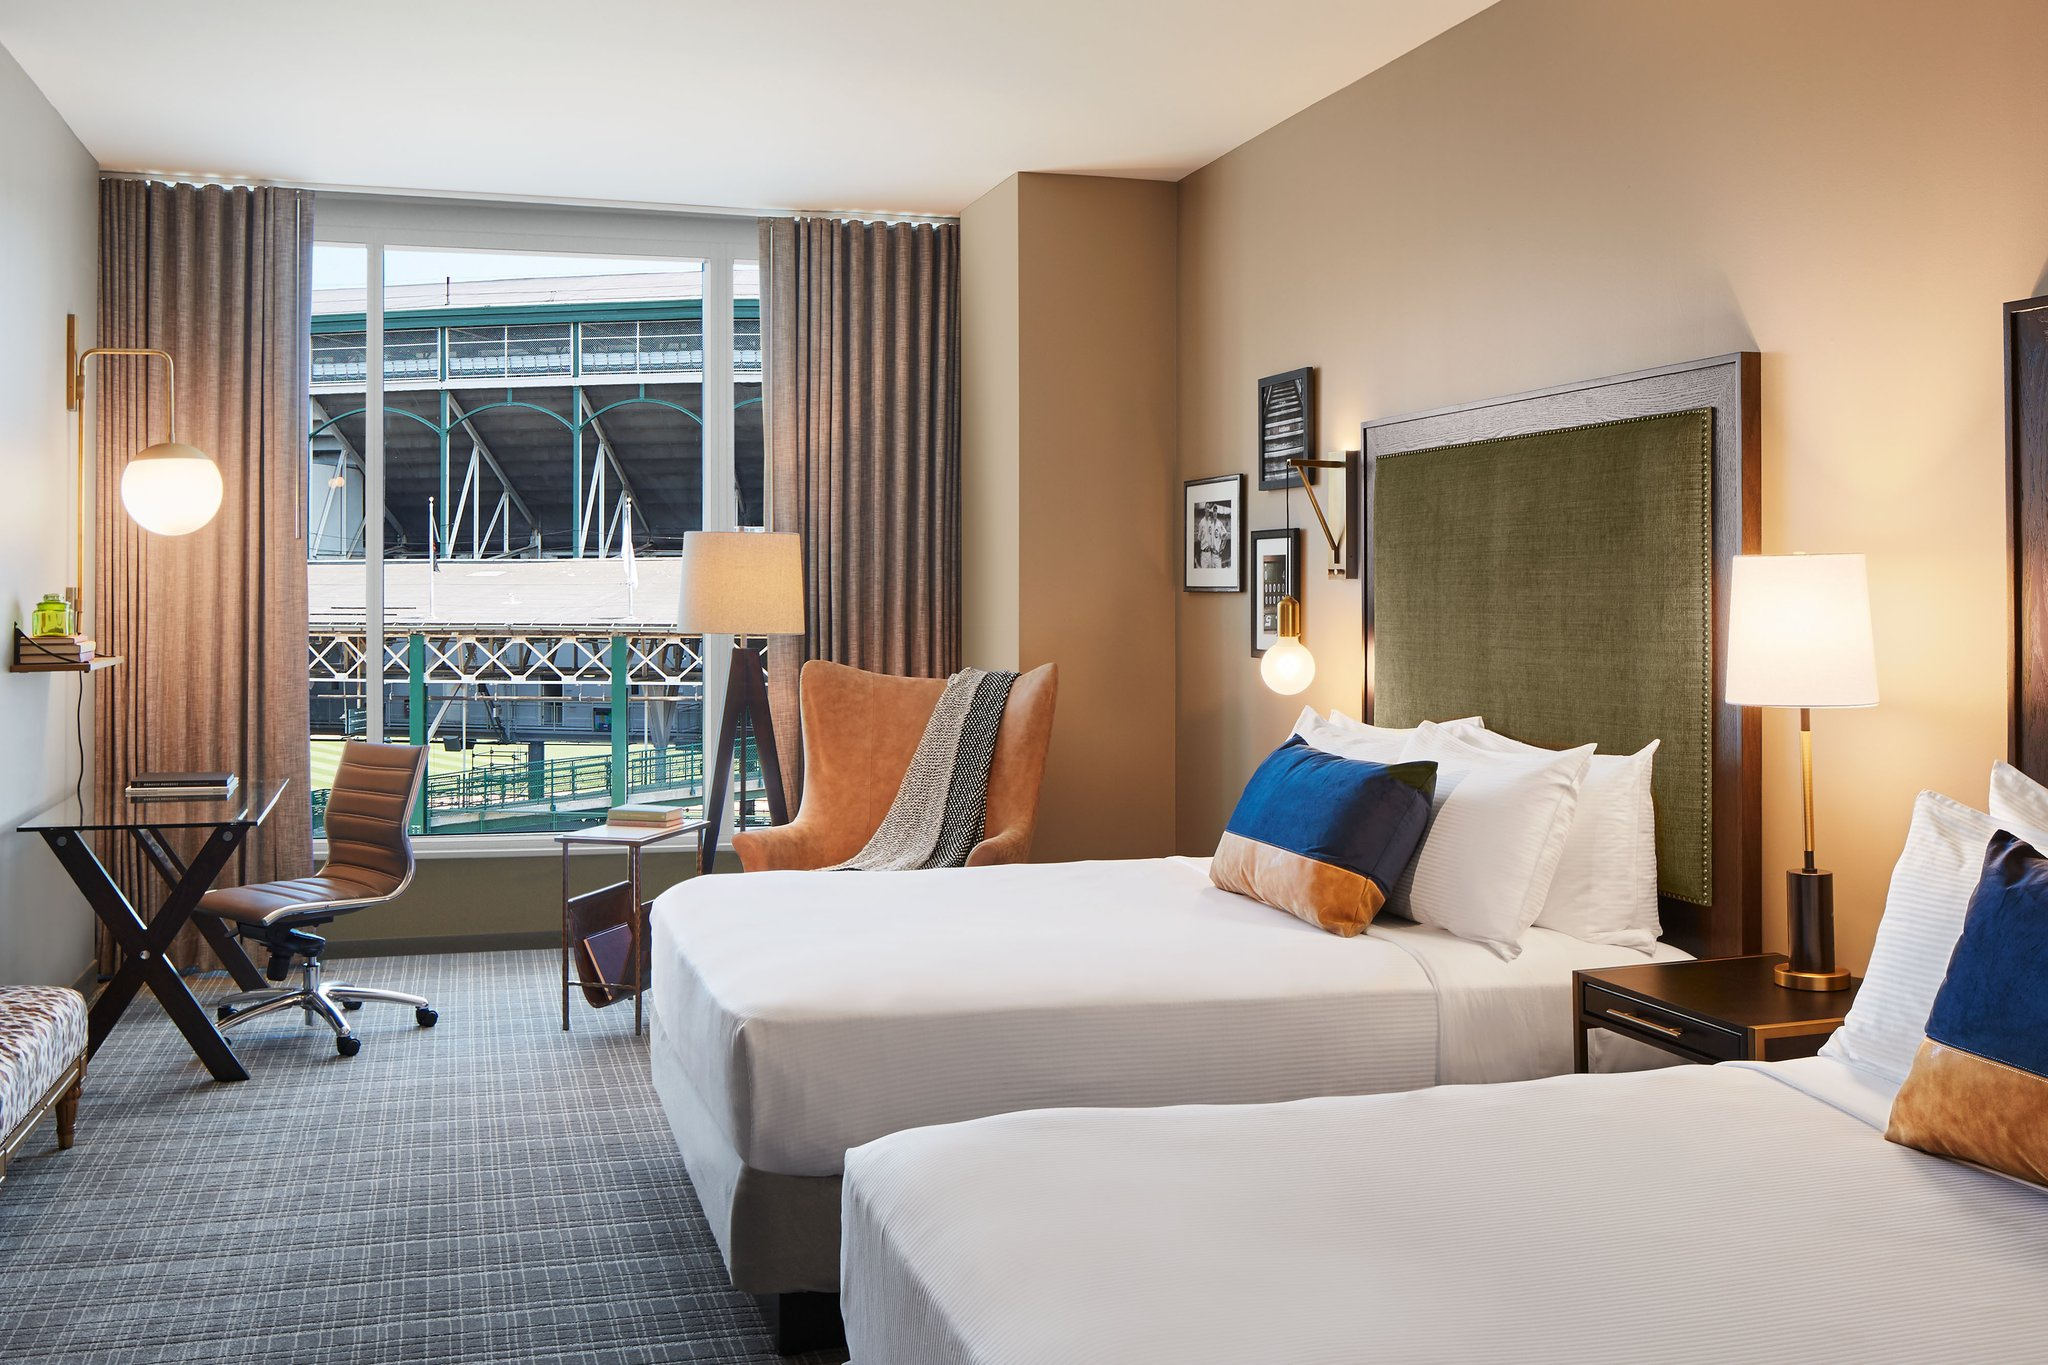 Hotel Zachary Chicago, a Tribute Portfolio Hotel